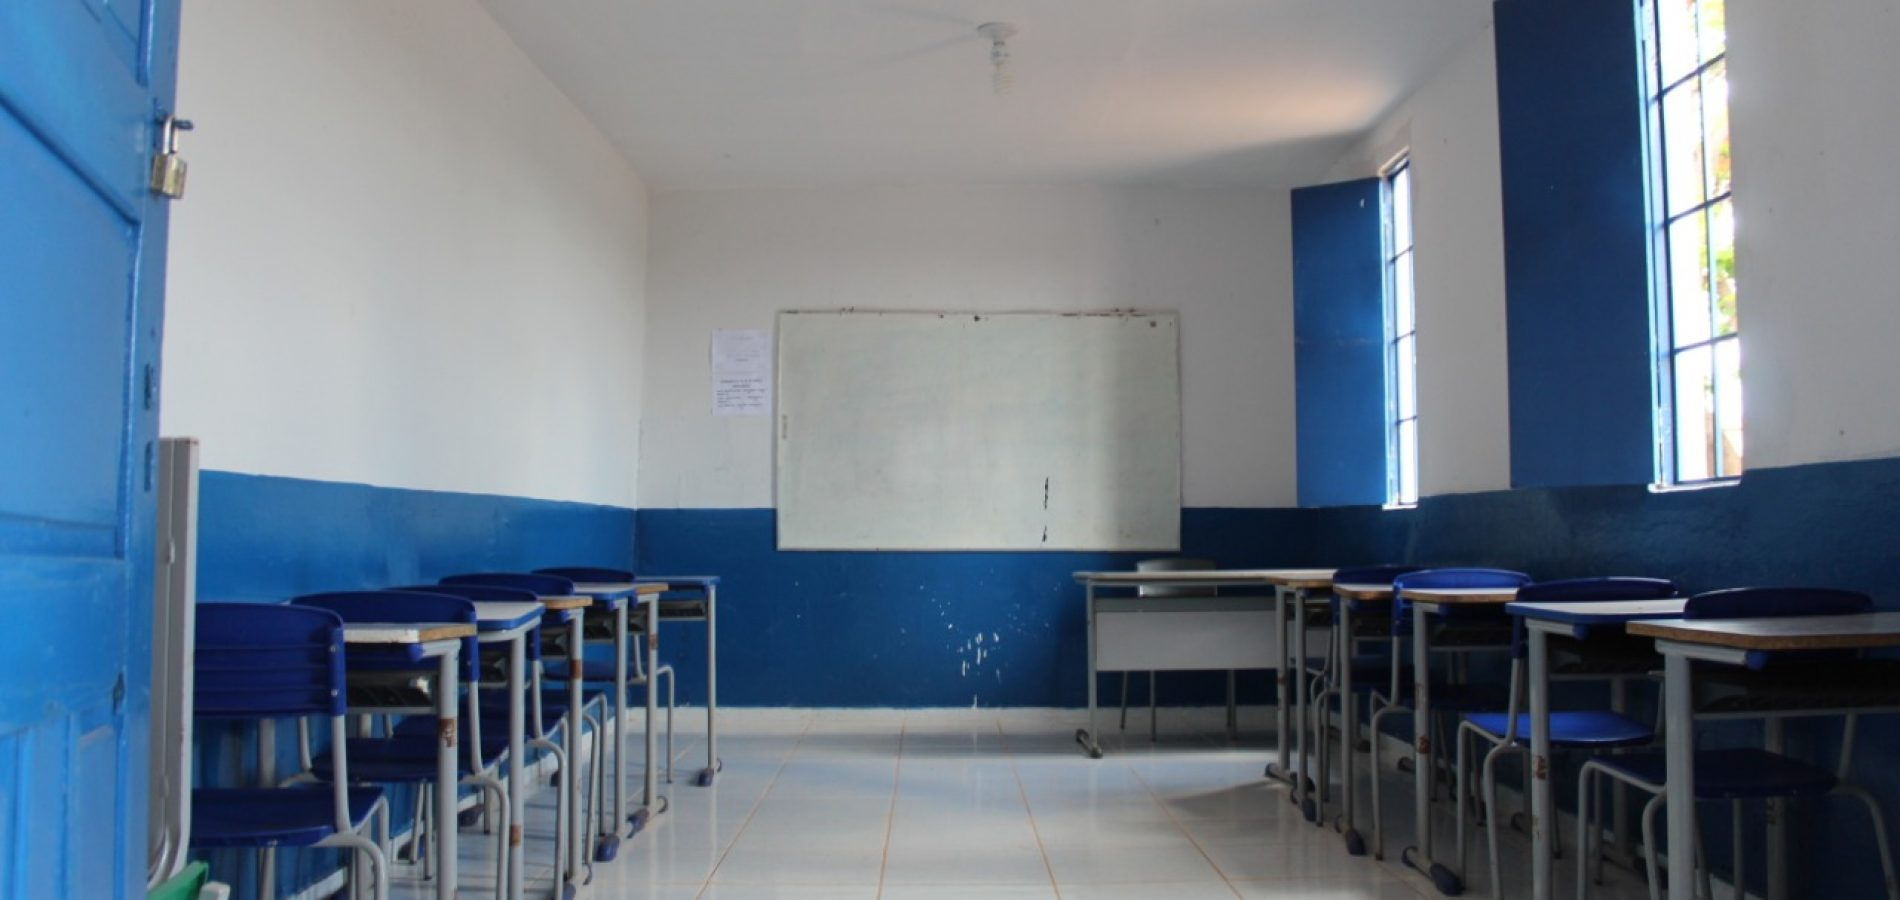 Ampliada oferta de Ensino Médio de tempo integral no PiAUI